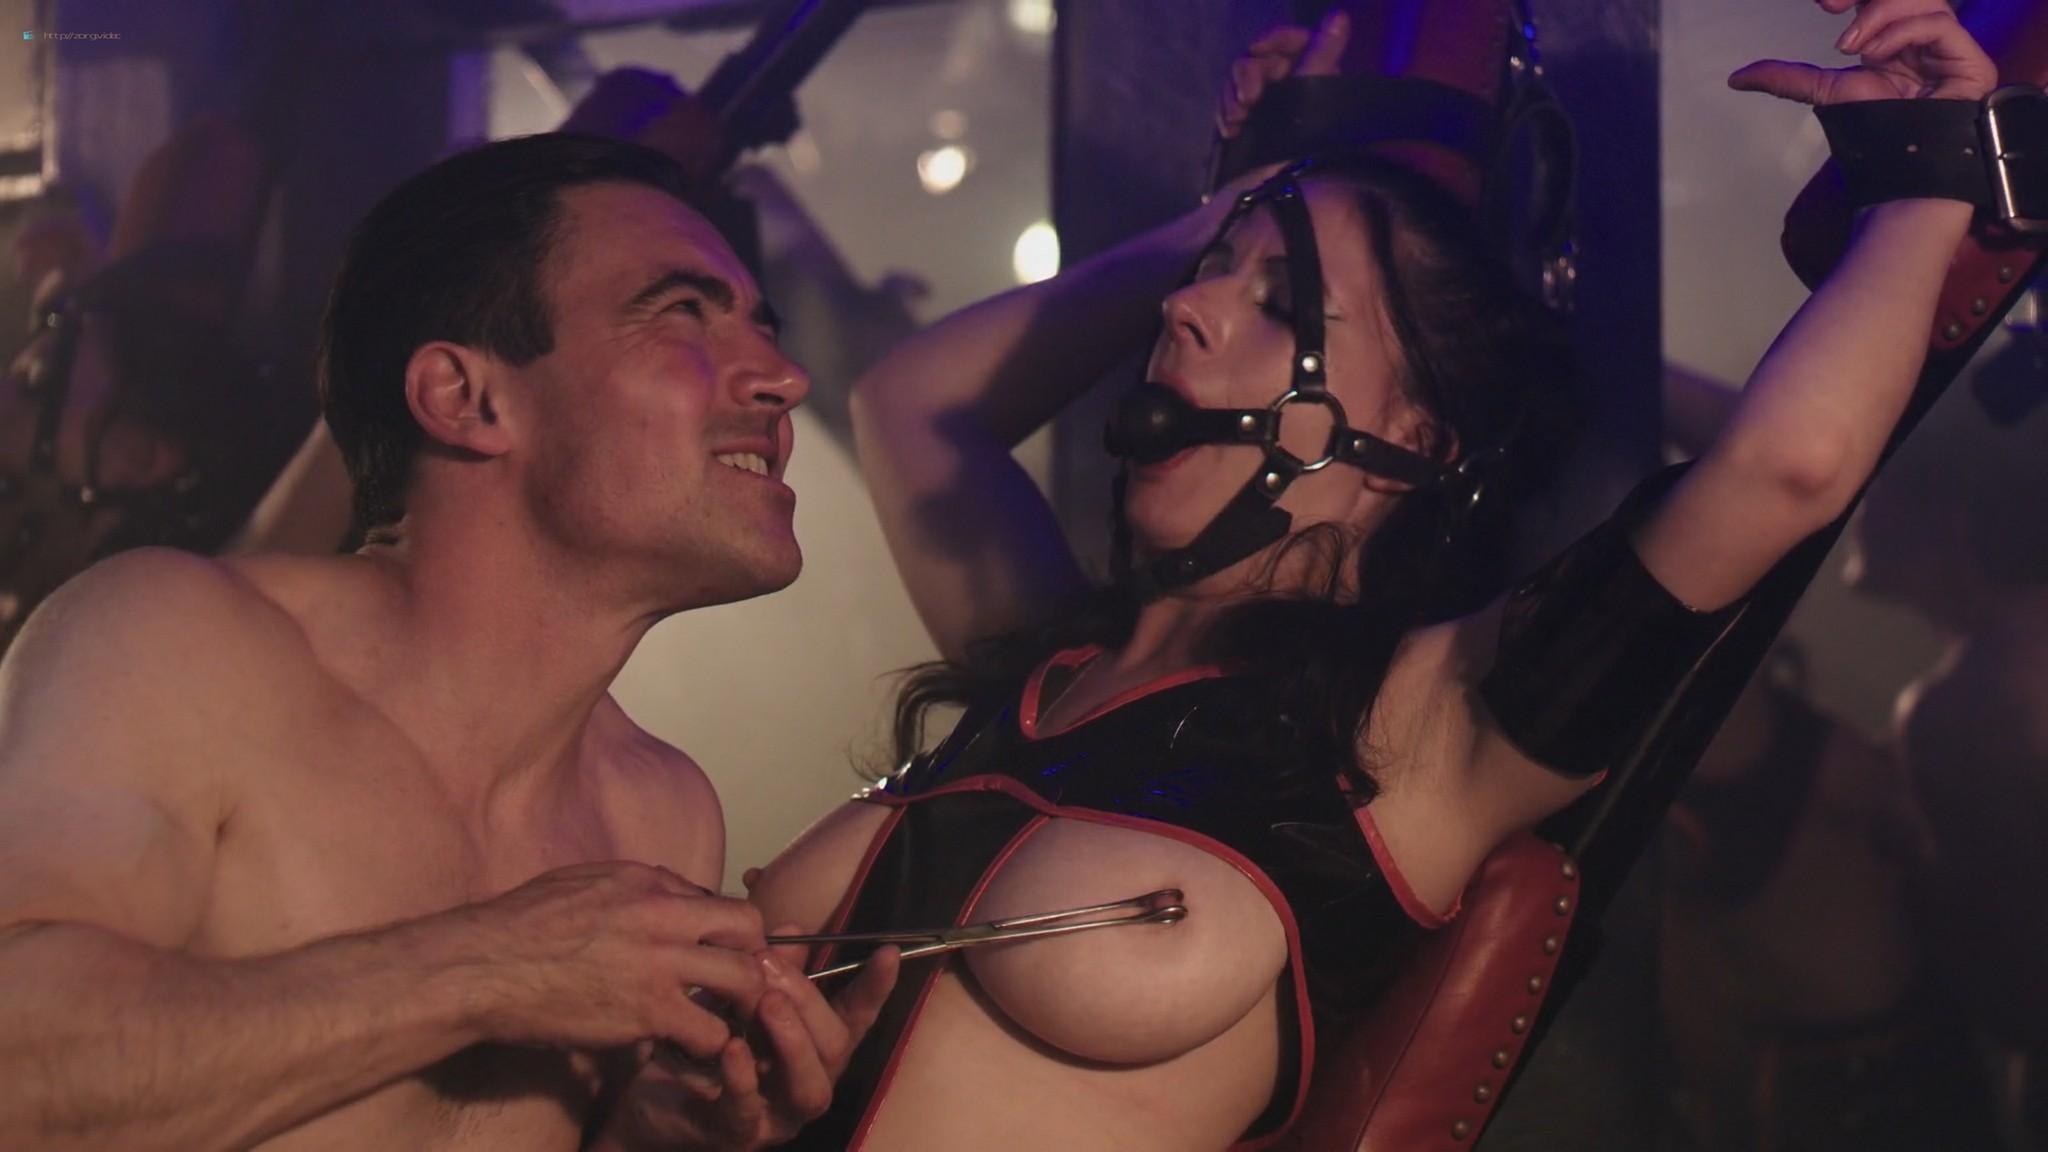 Keely Cat Wells nude Claudine-Helene Aumord full-frontal - Dirty Work (2018) HD 1080p Web (5)